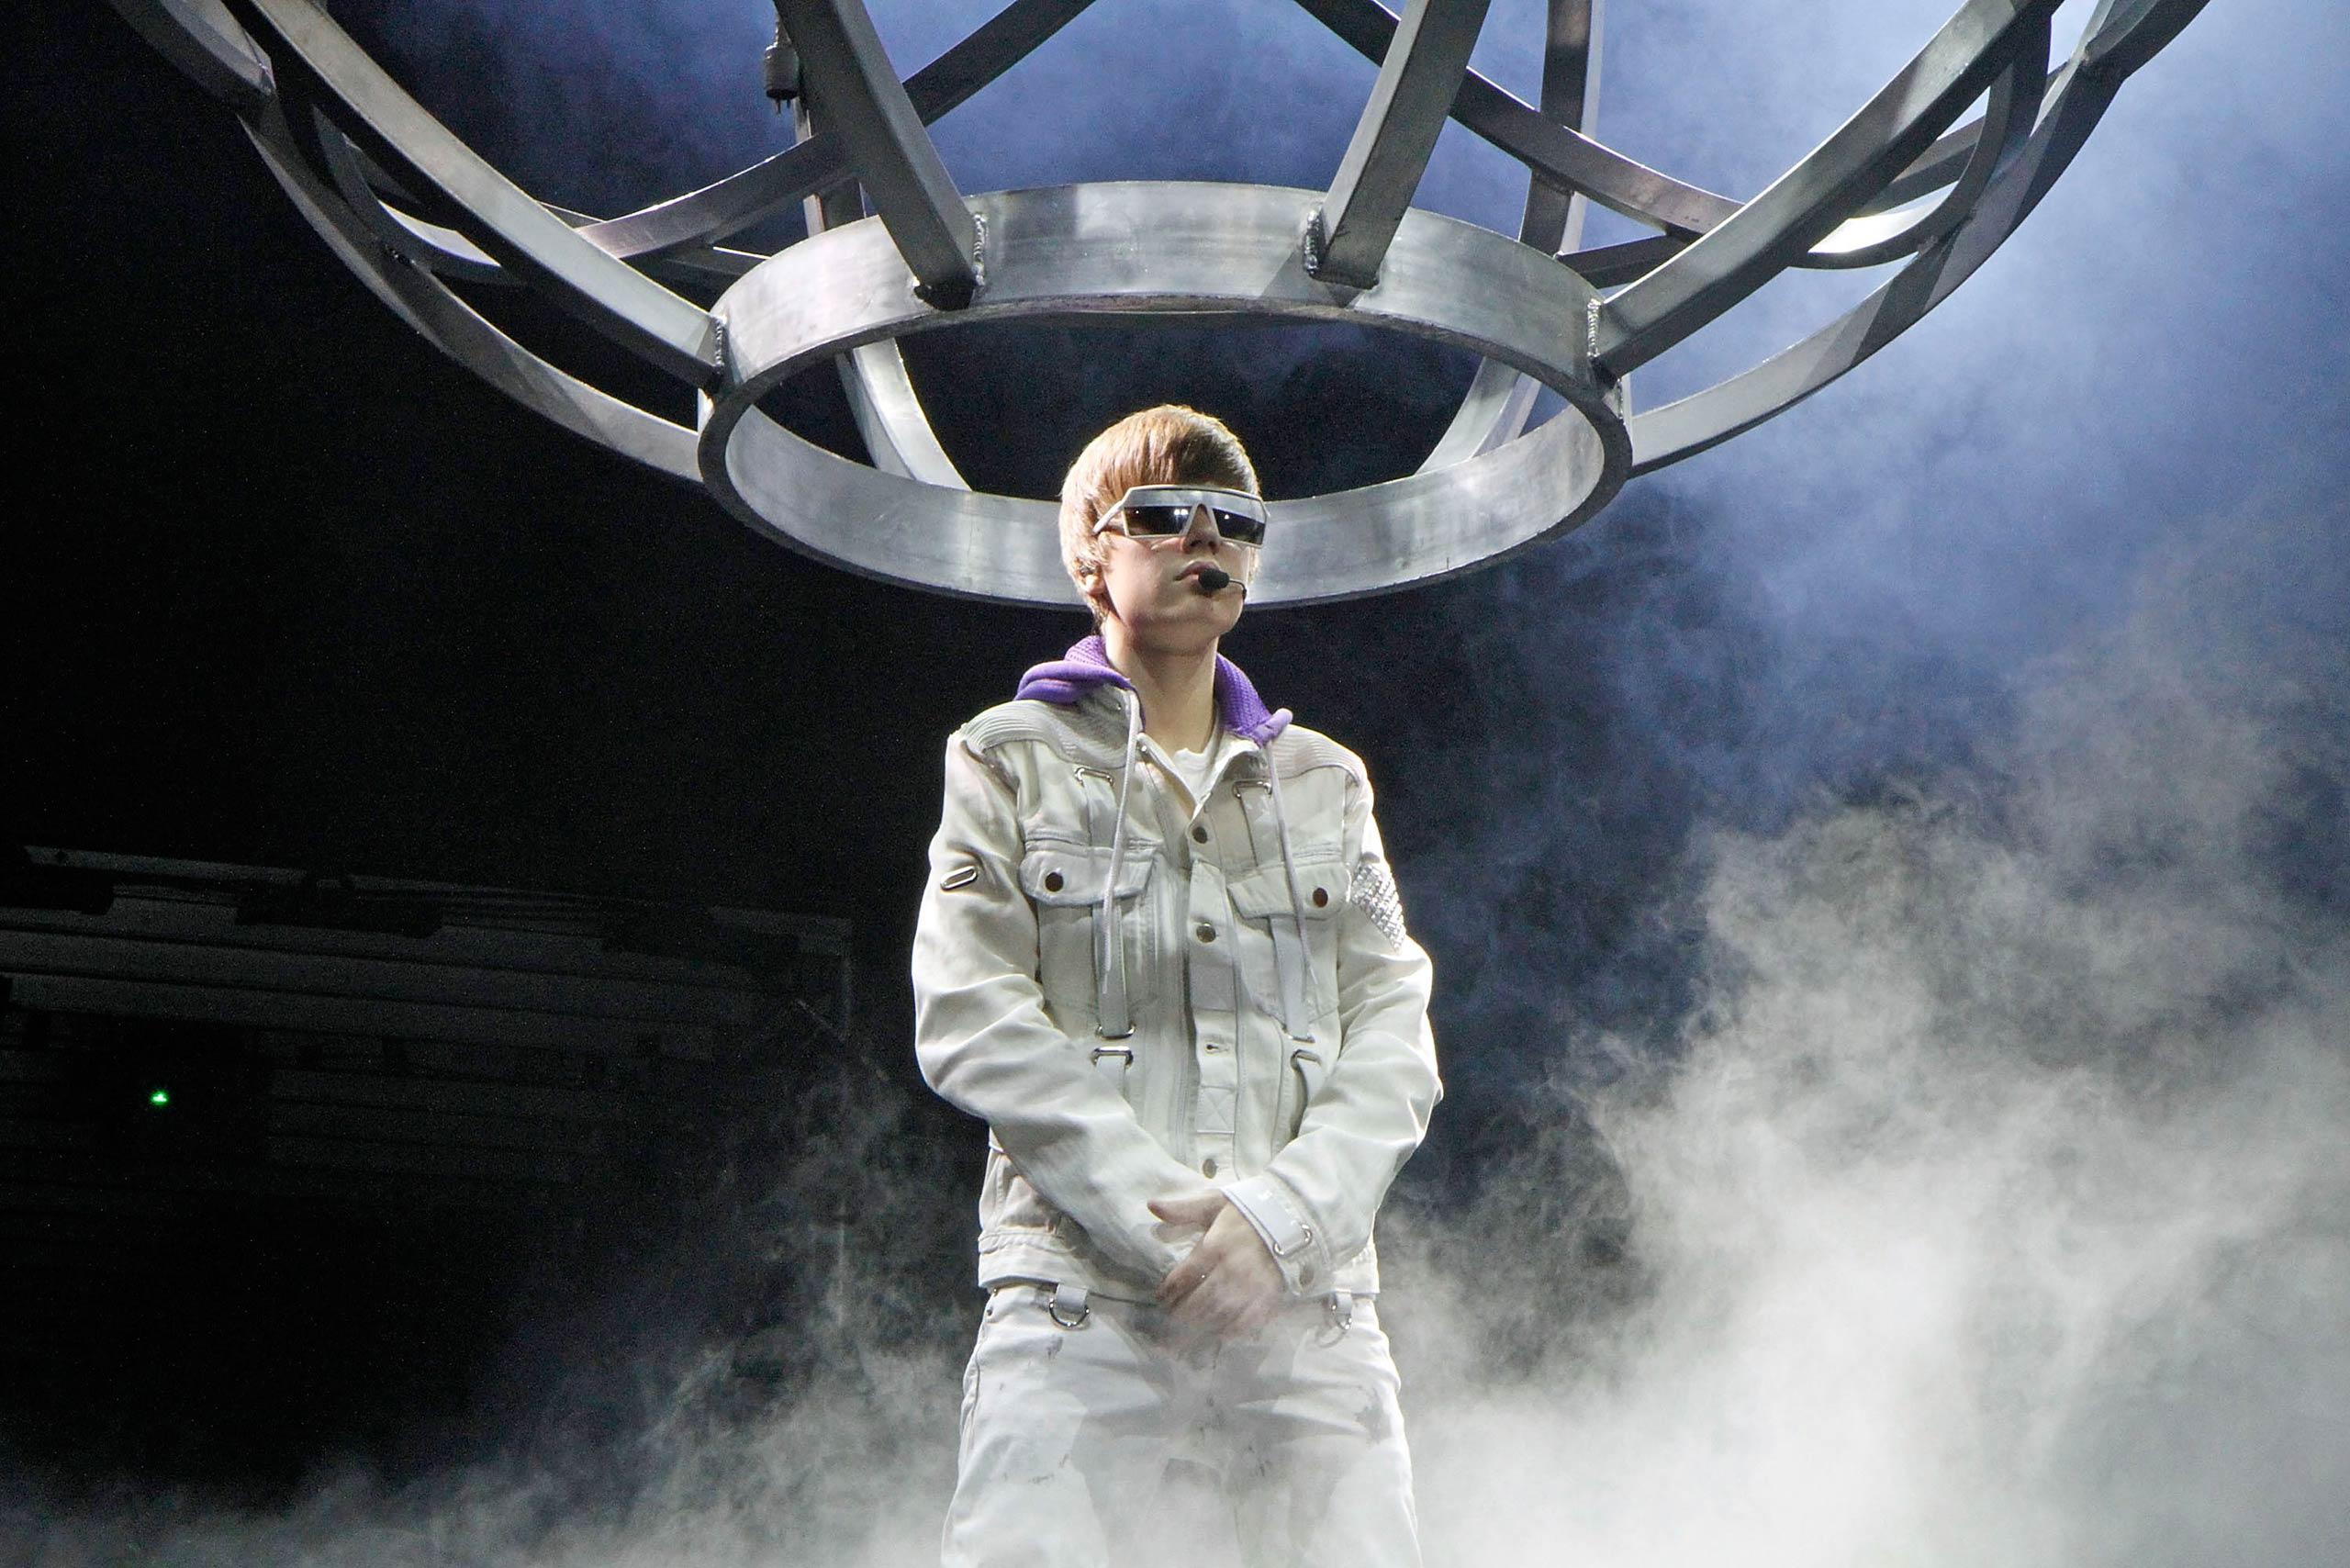 Justin Bieber performs at the Atlantic City Boardwalk Hall in Atlantic City, NJ in 2010.